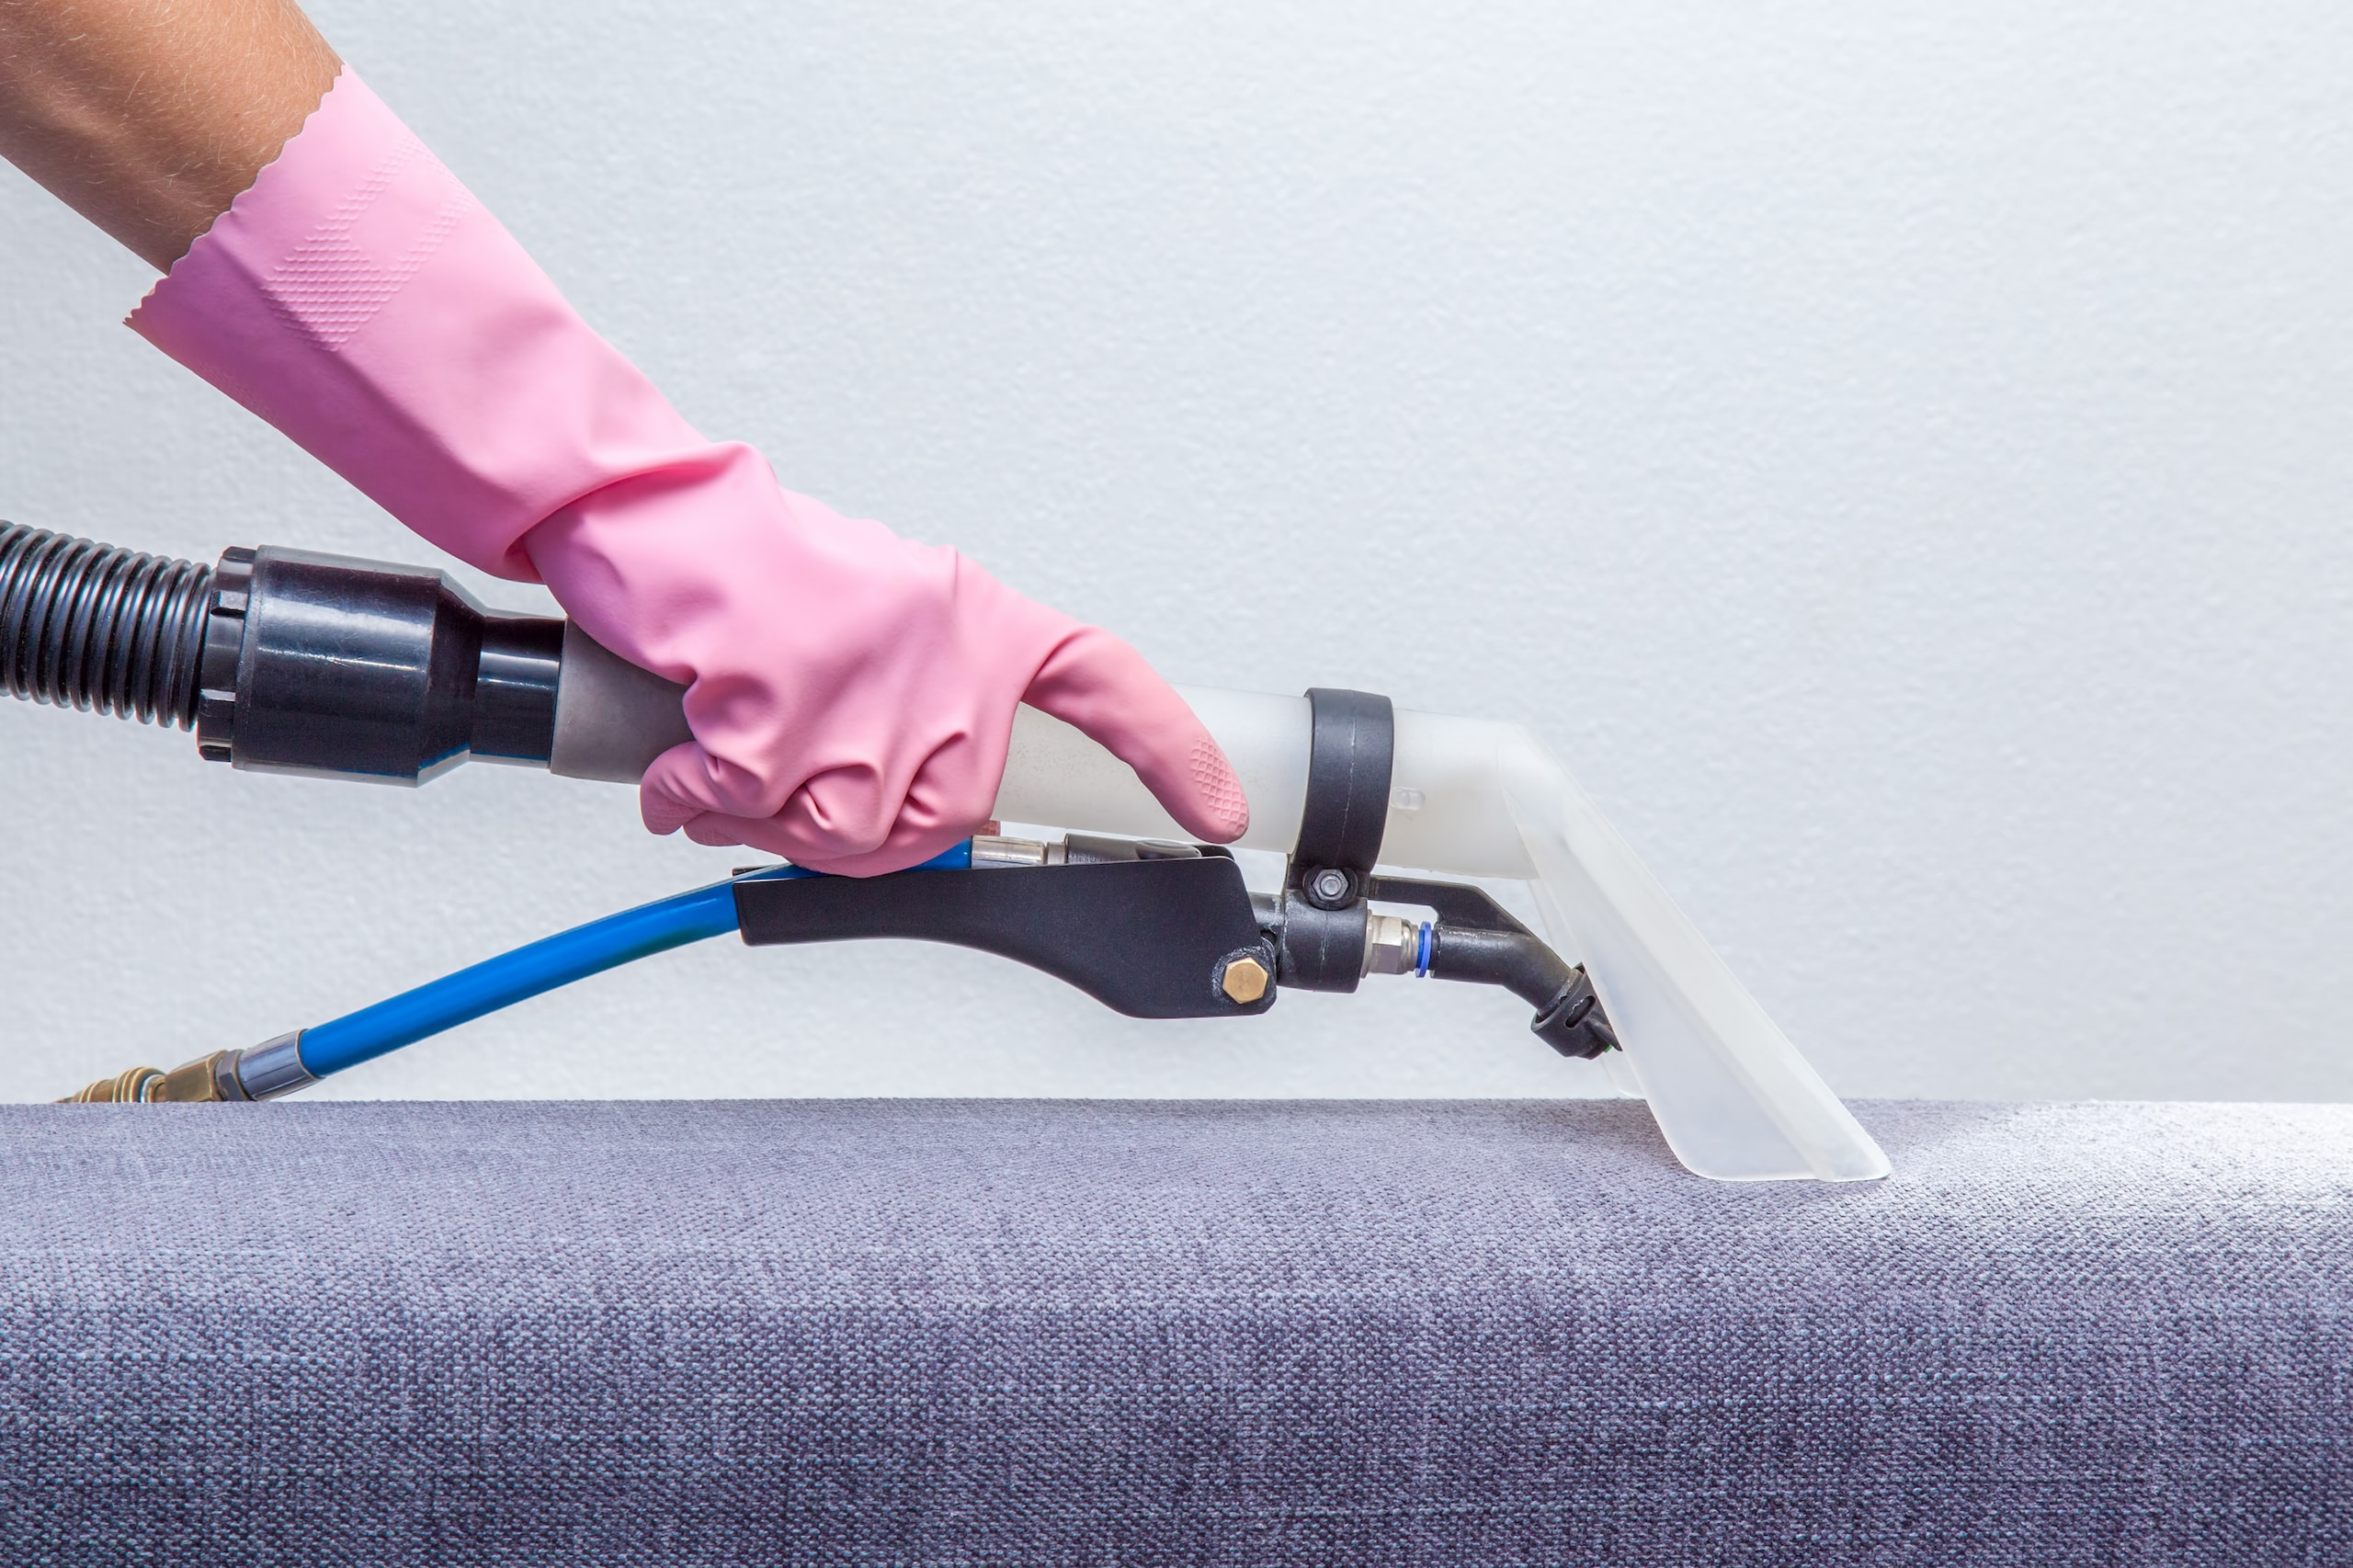 Бизнес химчистки мягкой мебели